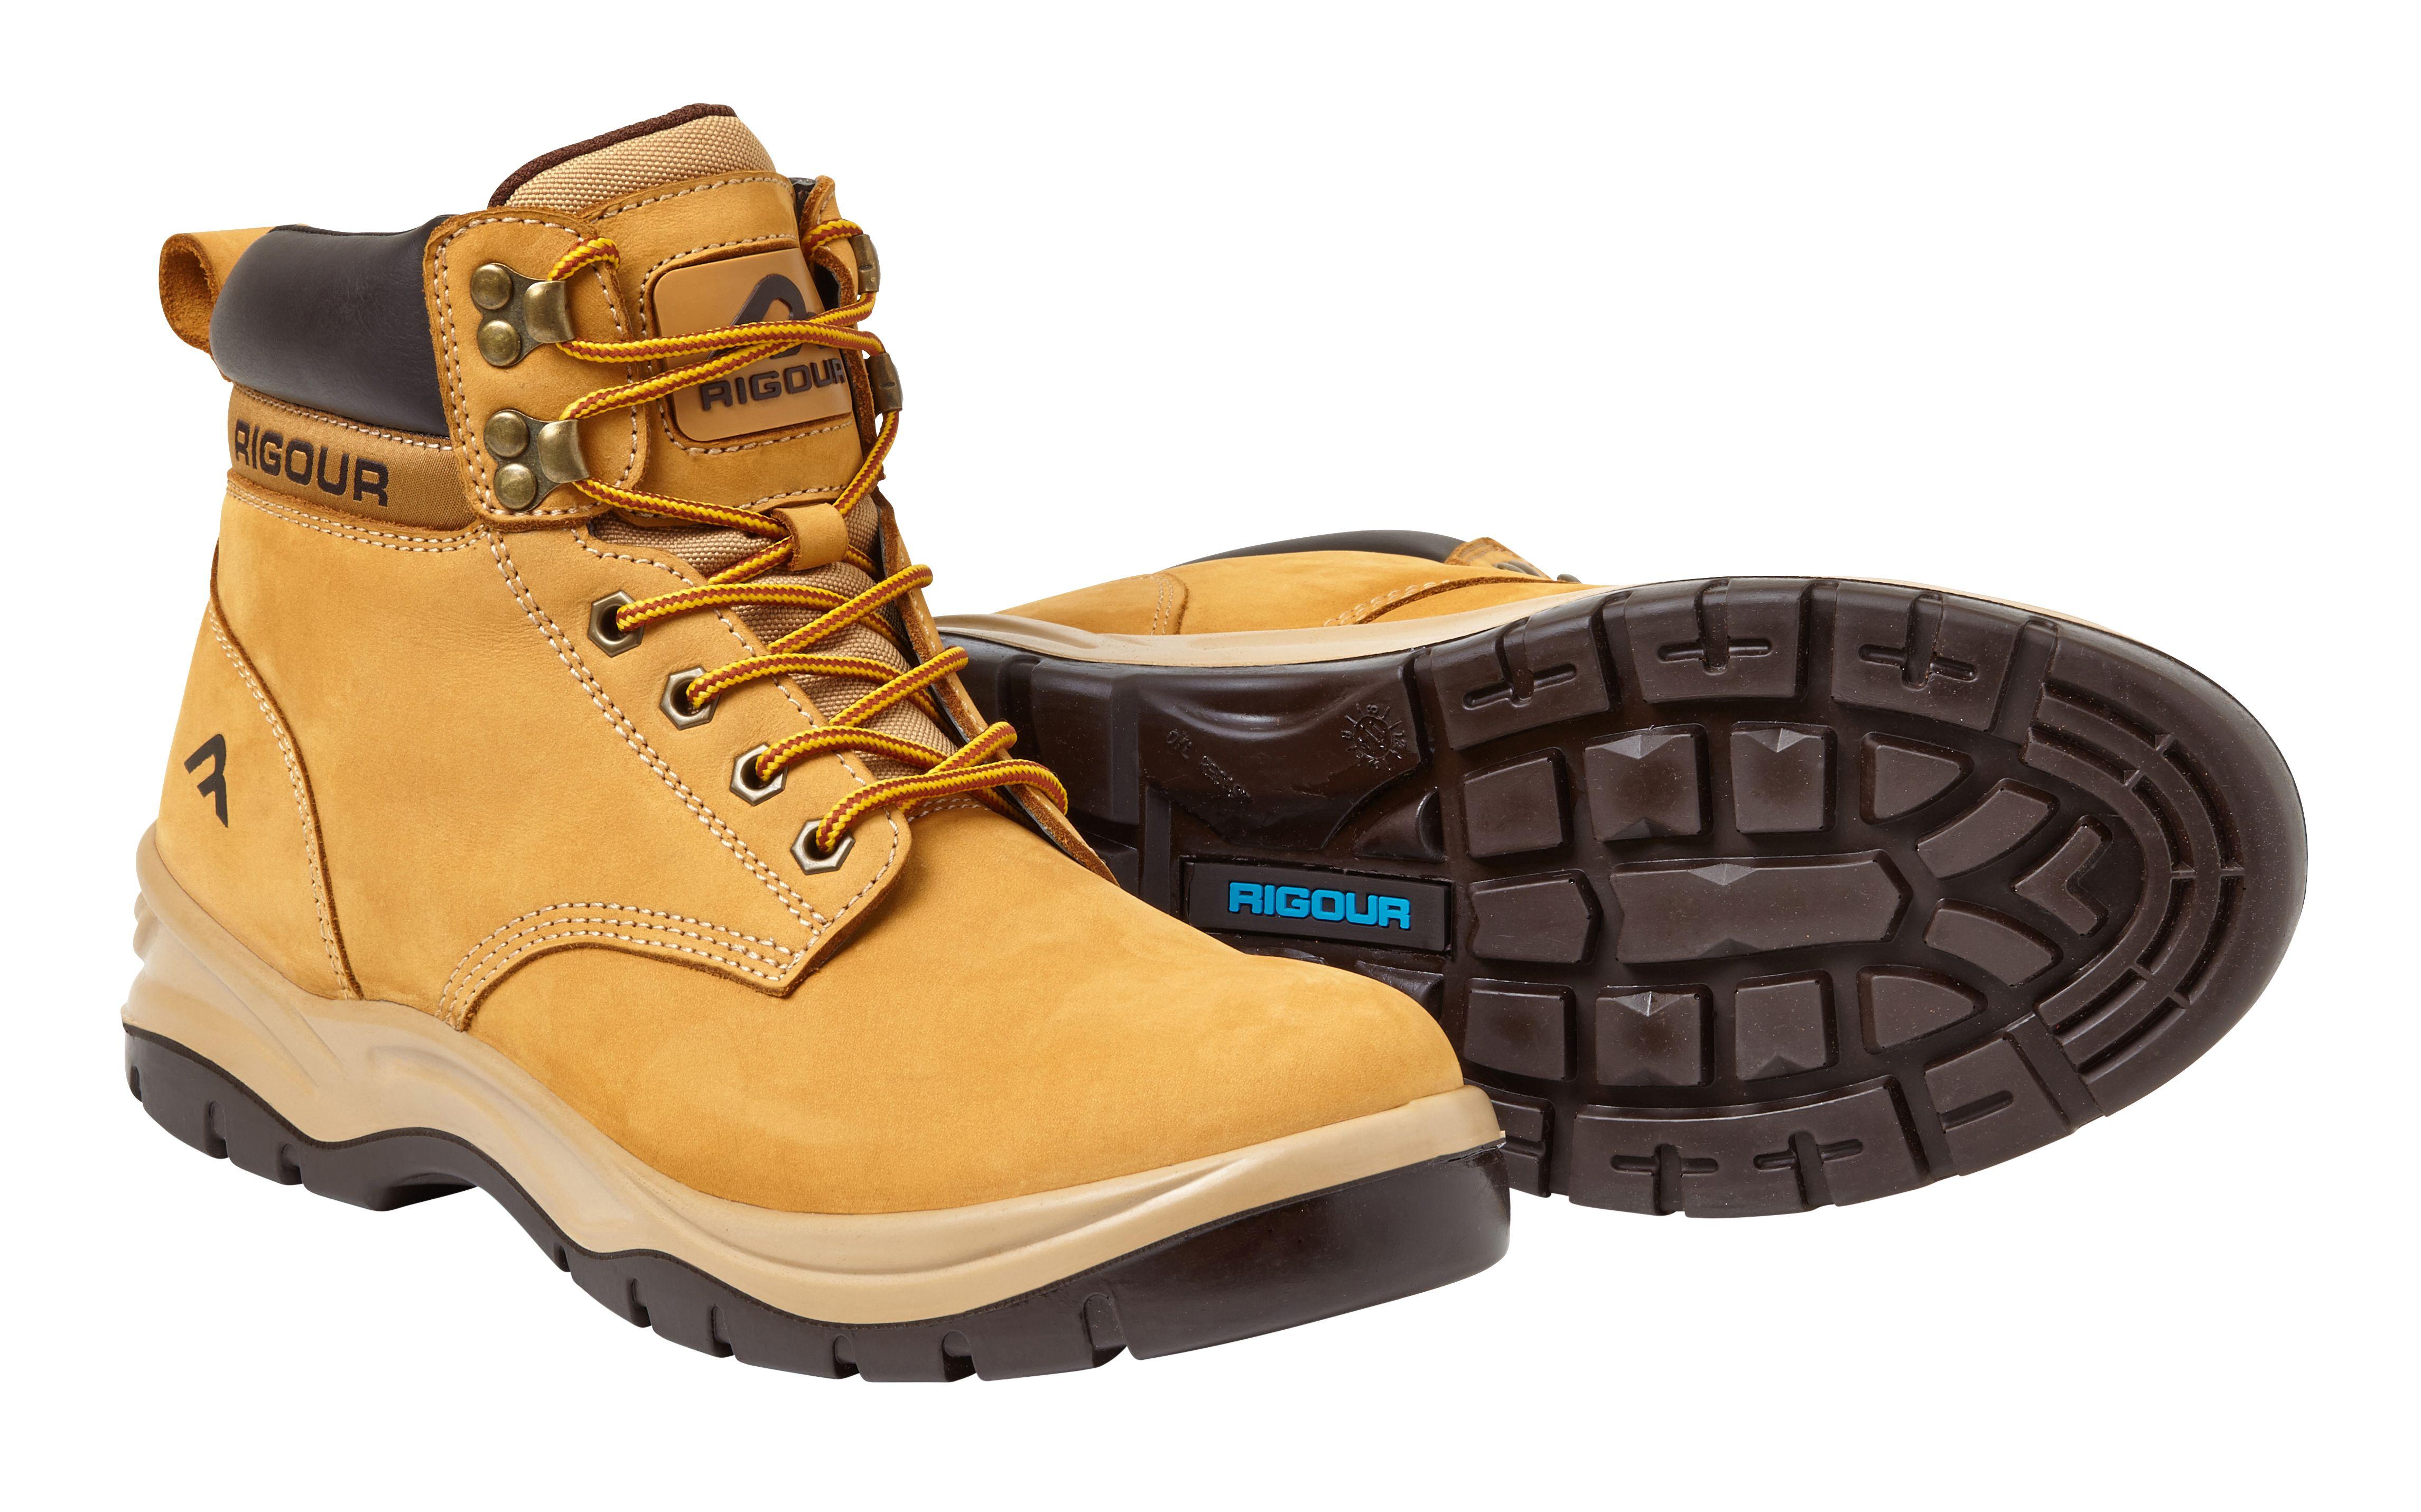 Rigour Wheat Safety Work Boots, Size 10